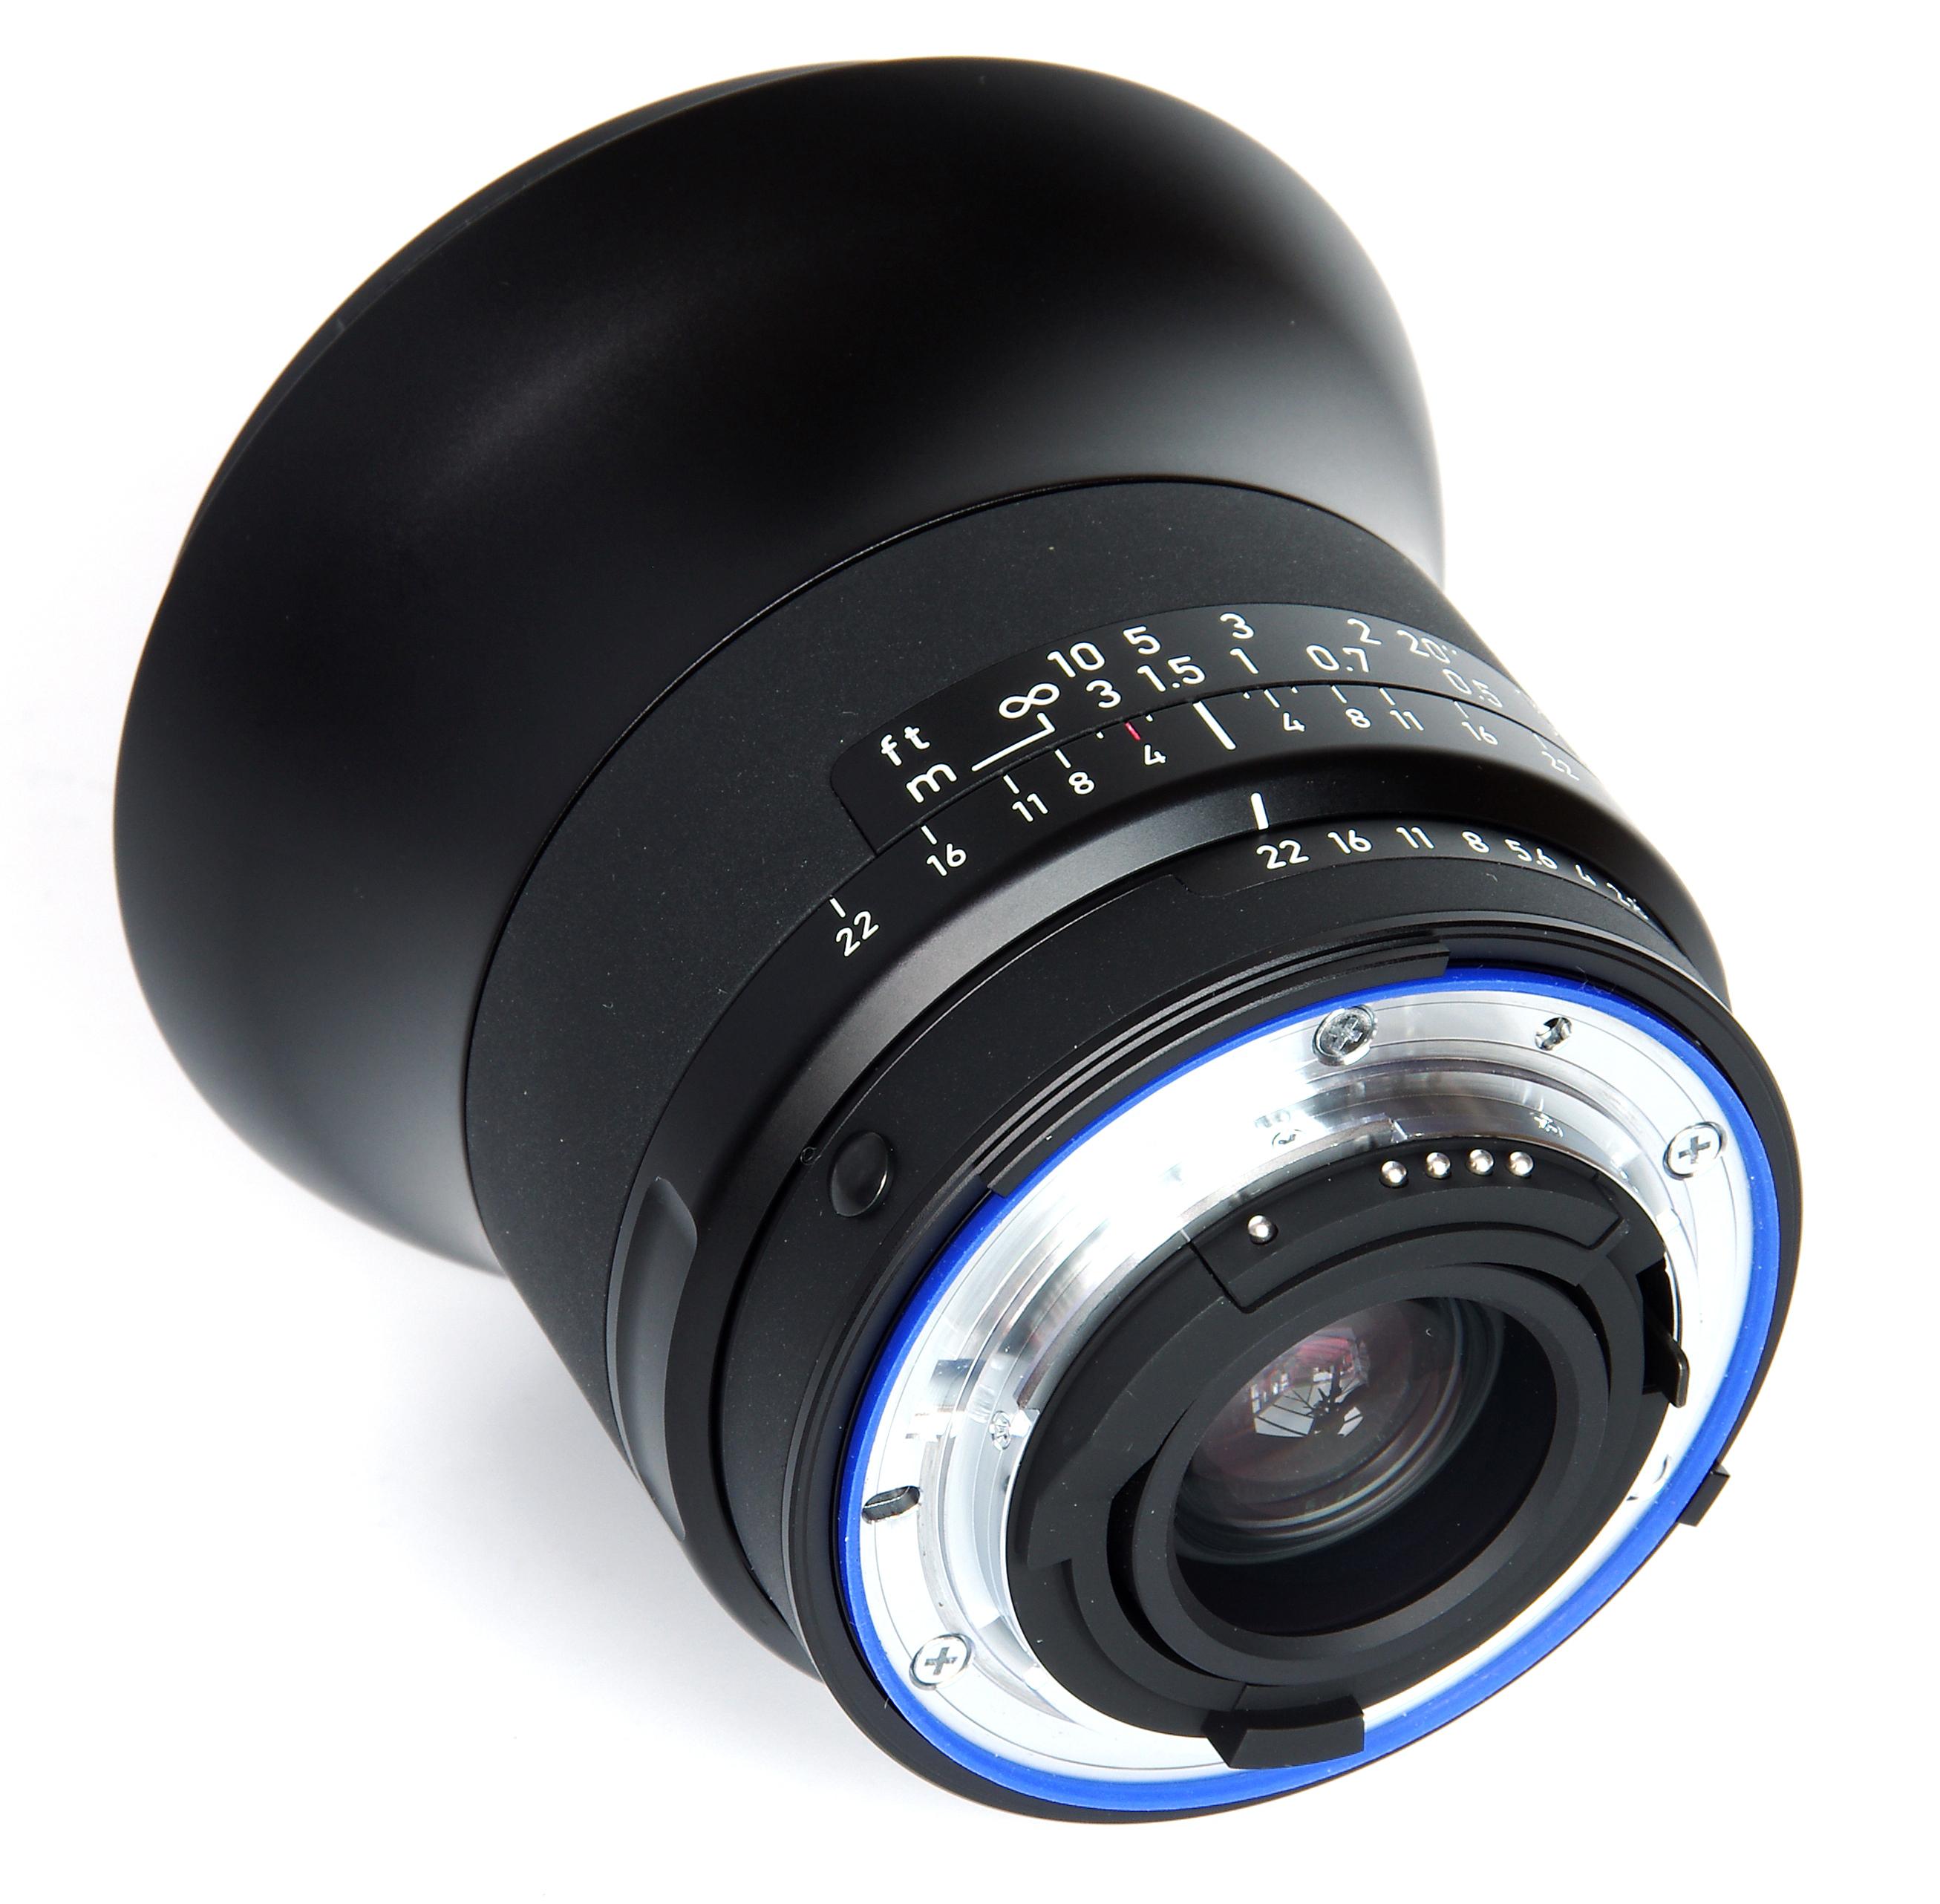 ZEISS 18mm f/3.5 Distagon T* ZK Manual Focus Lens - Black